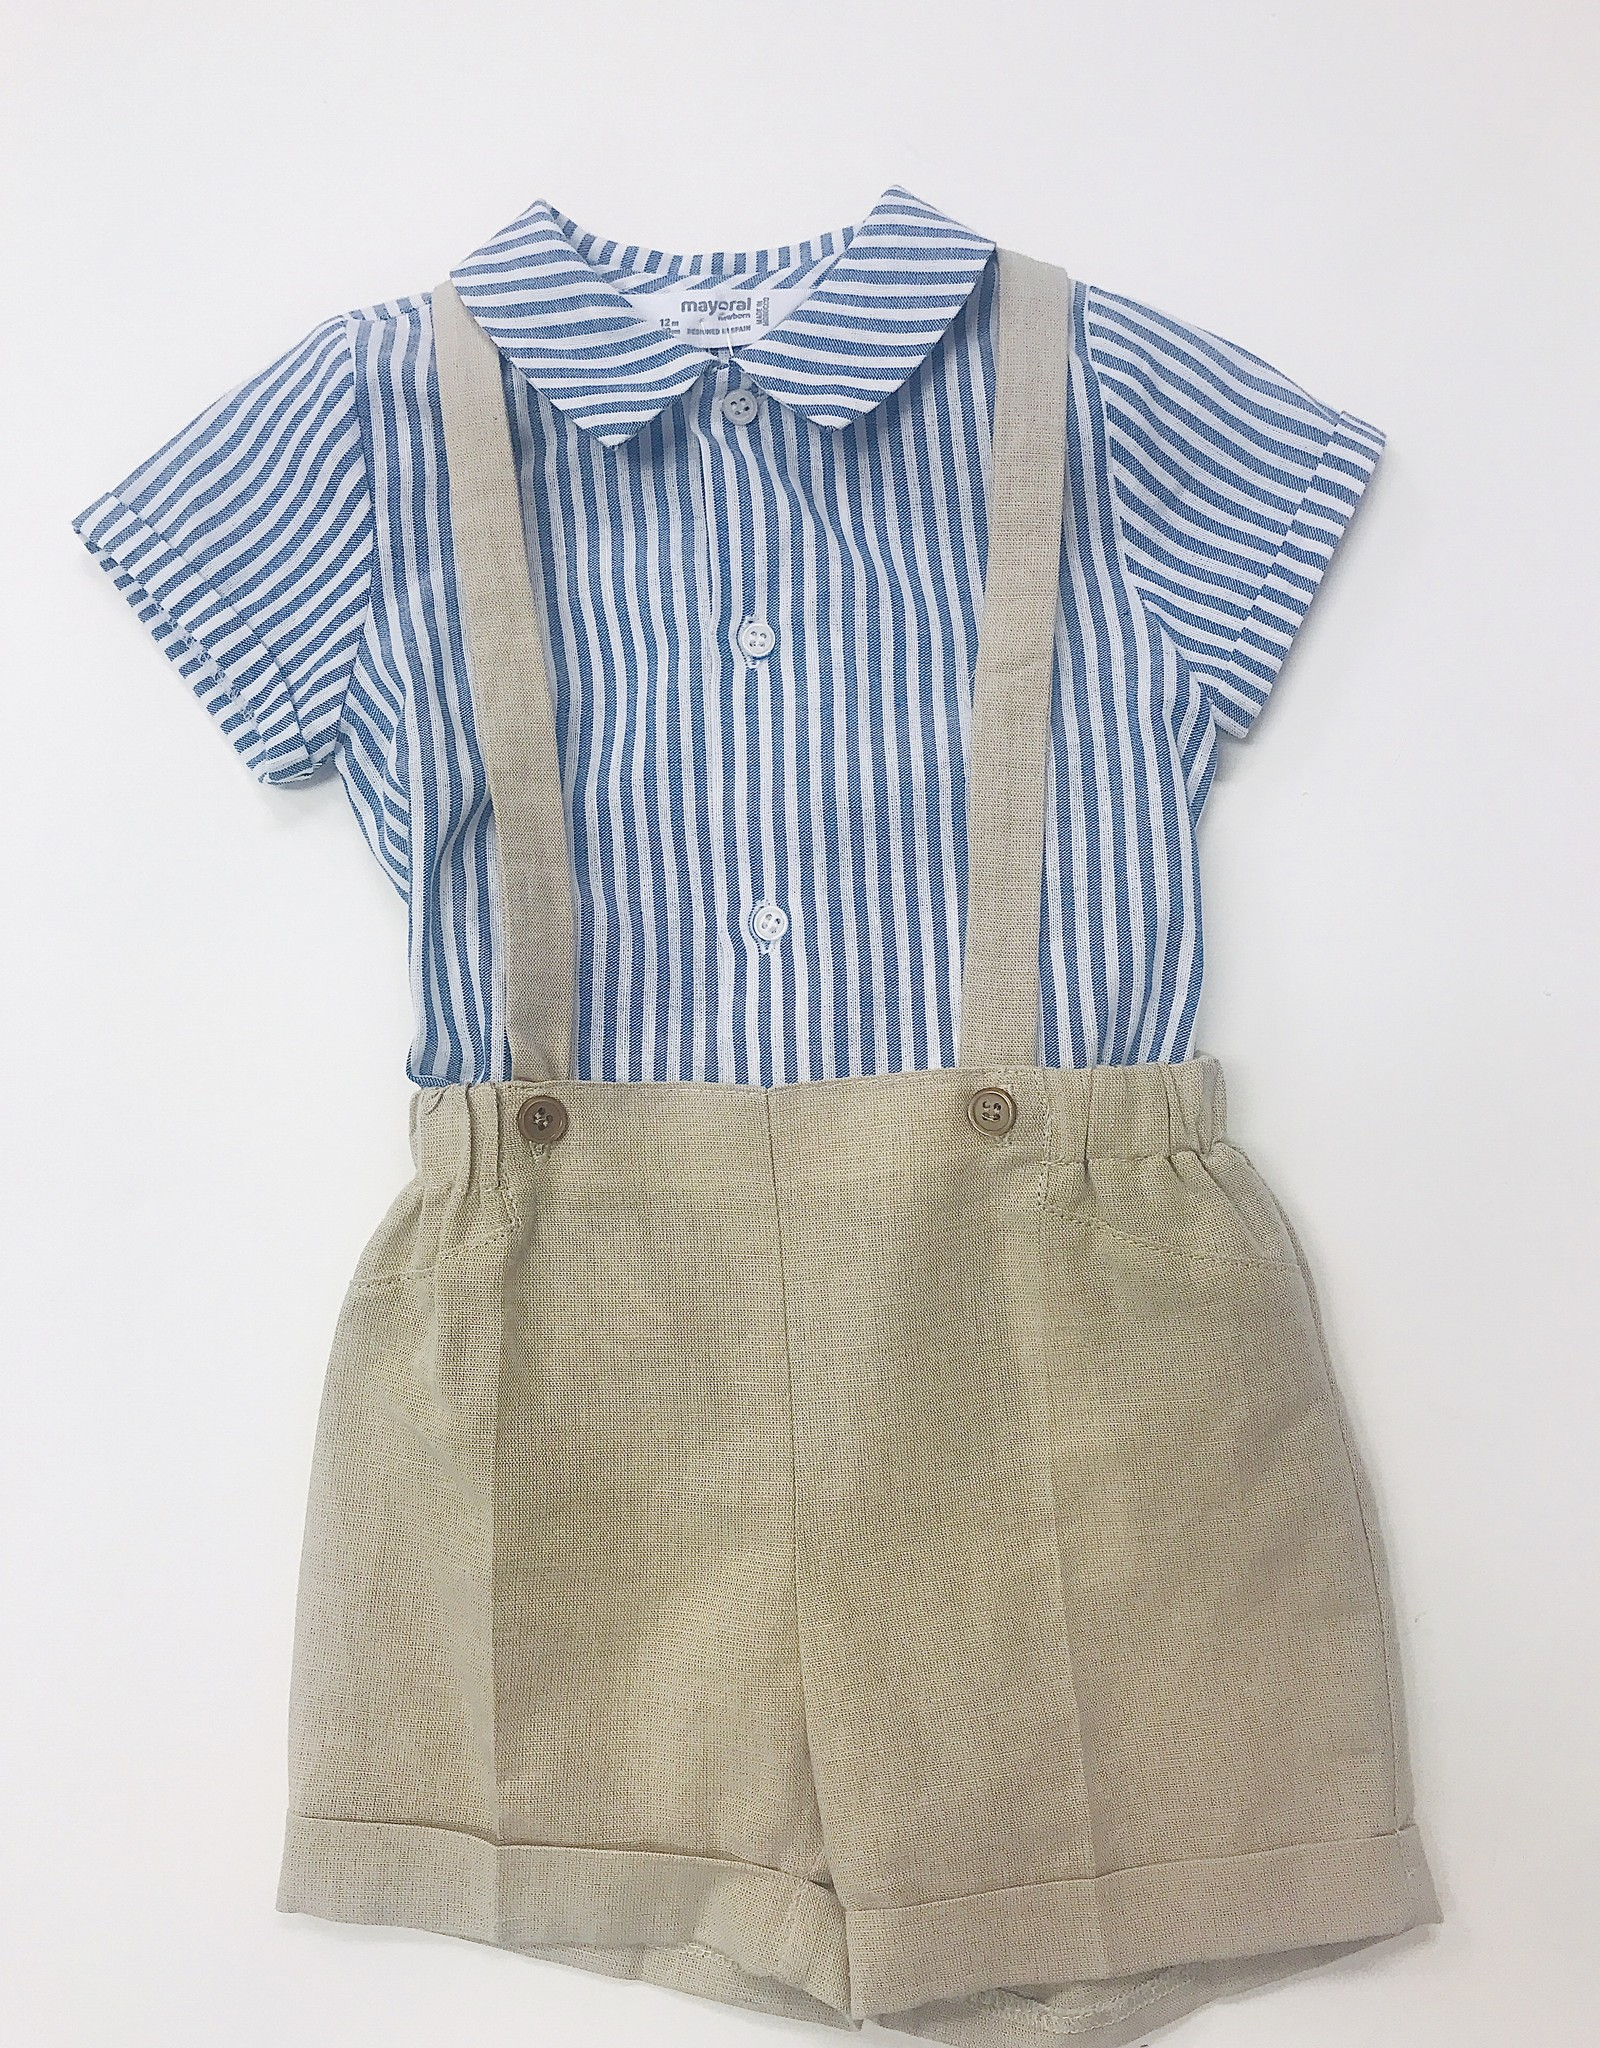 Mayoral Shortset khaki suspender blue stripe shirt Mayoral